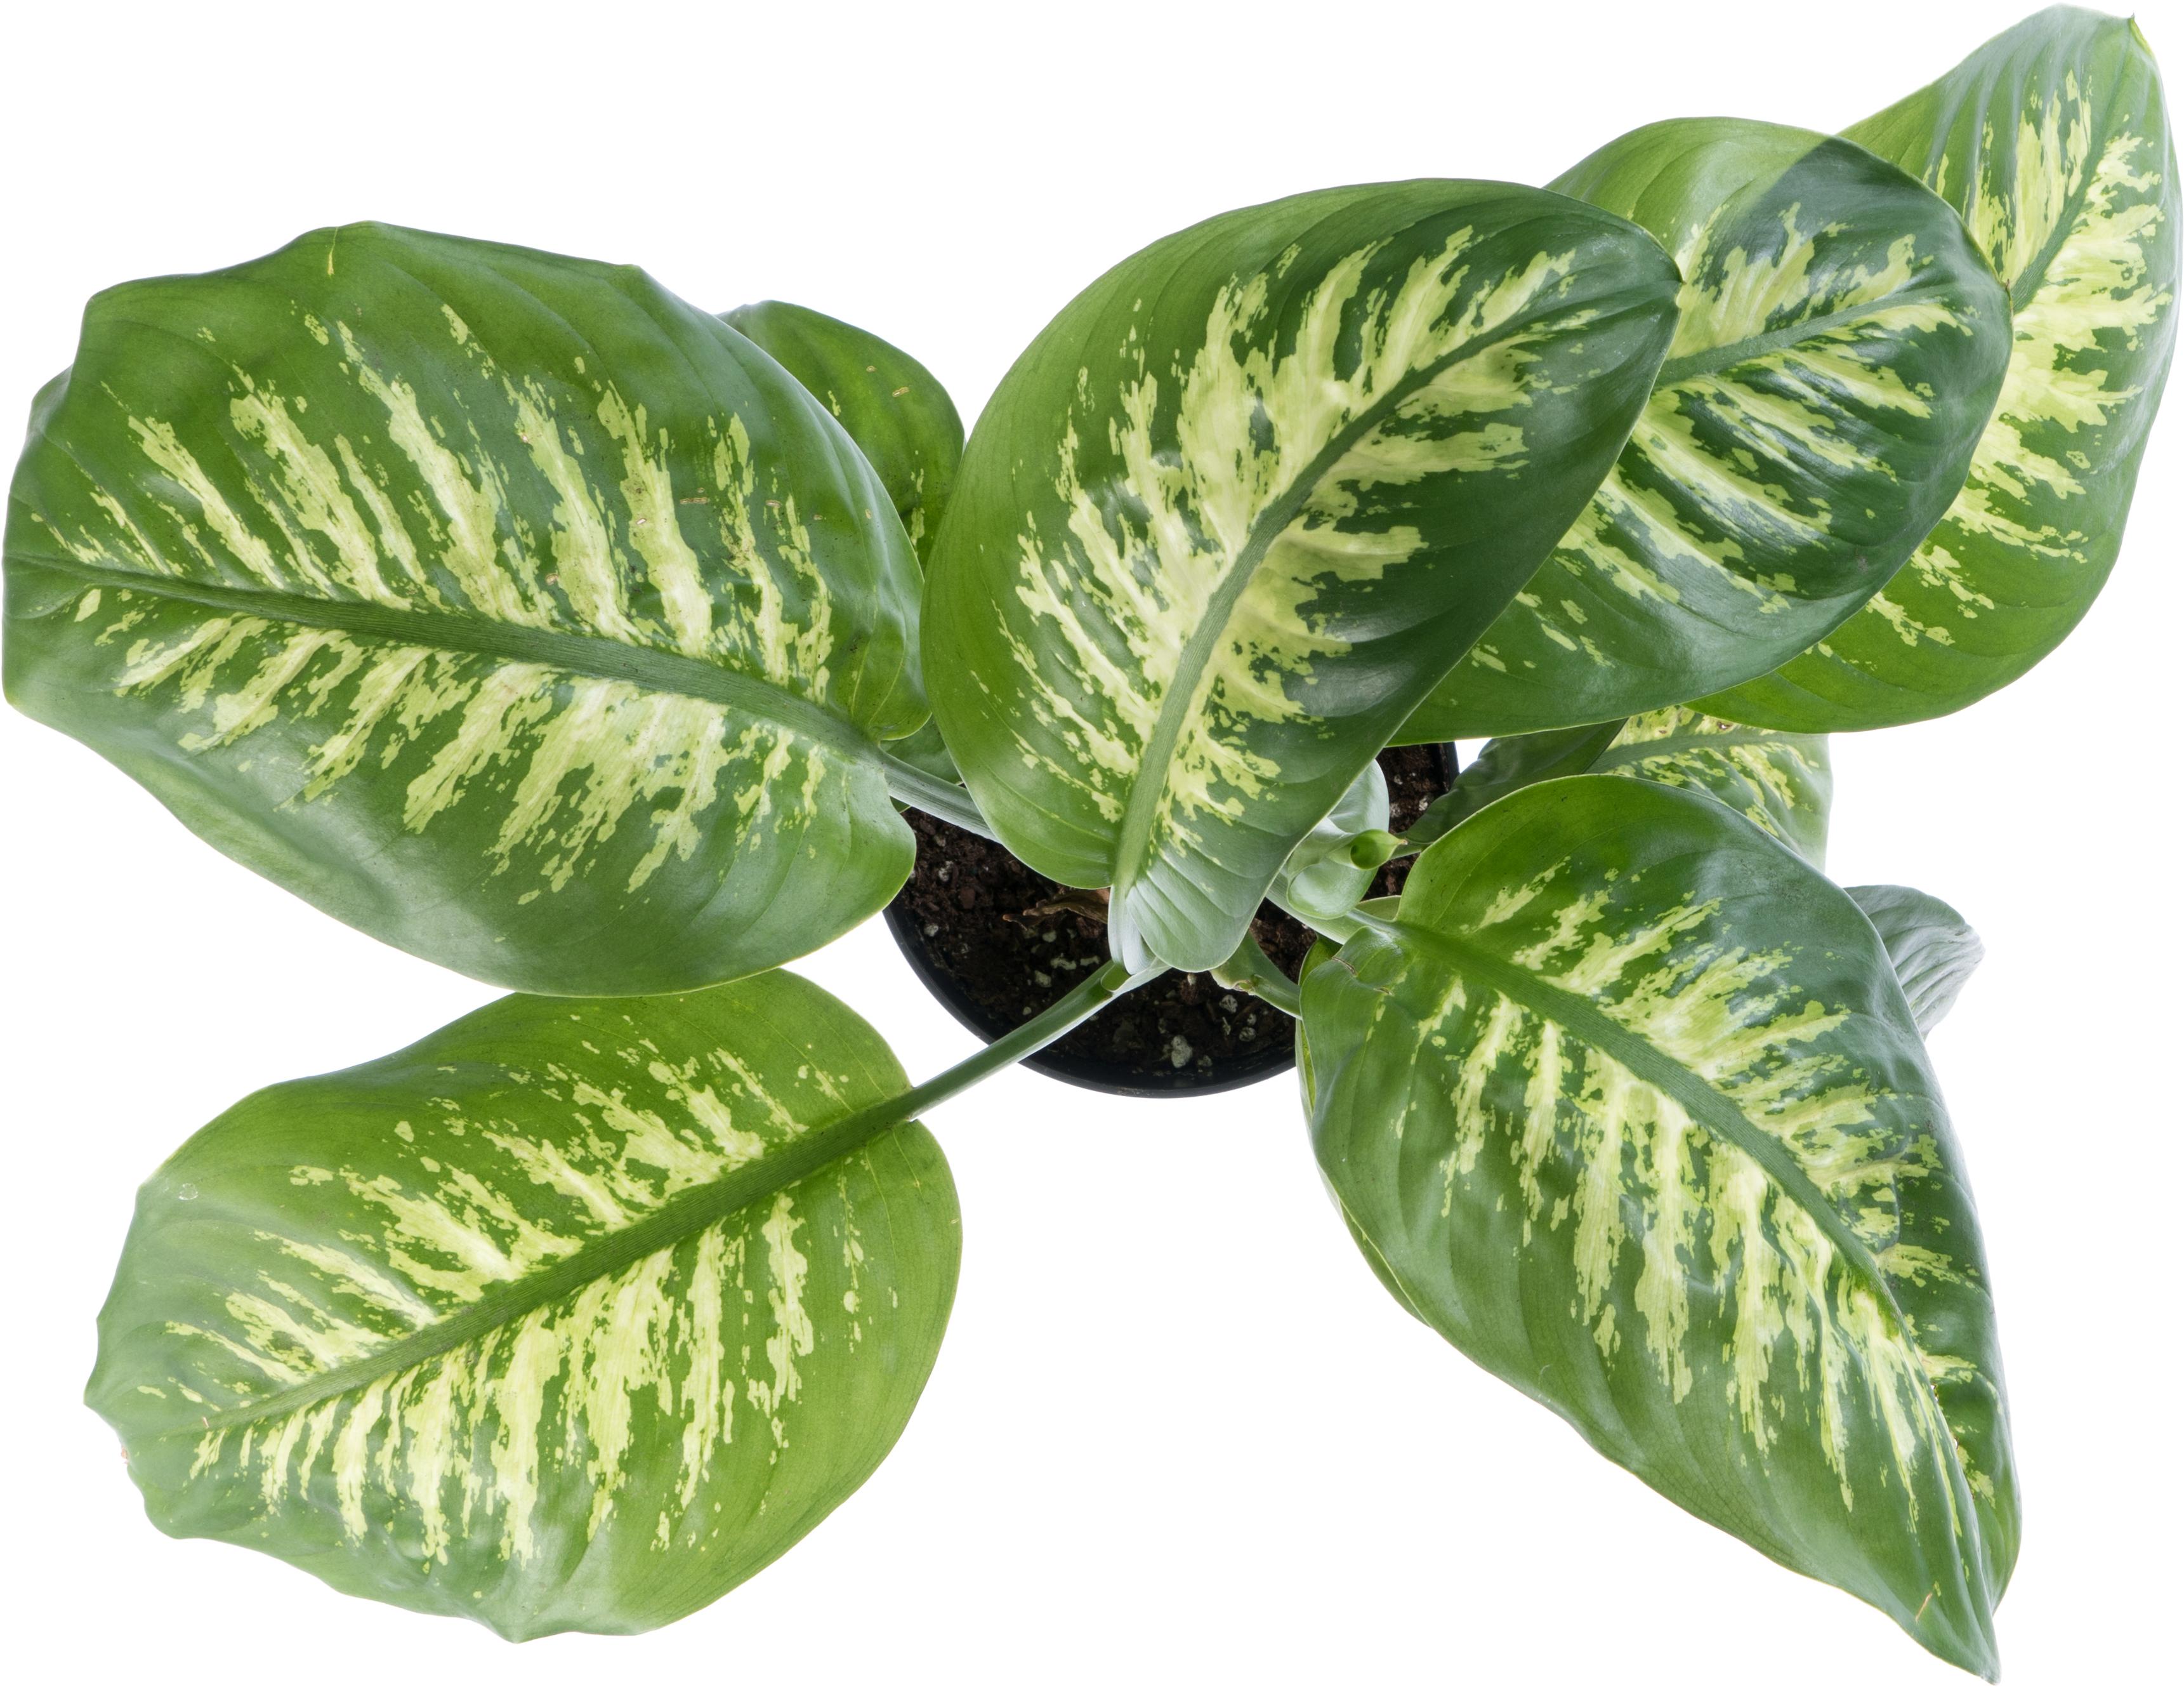 Leafy tropical plant